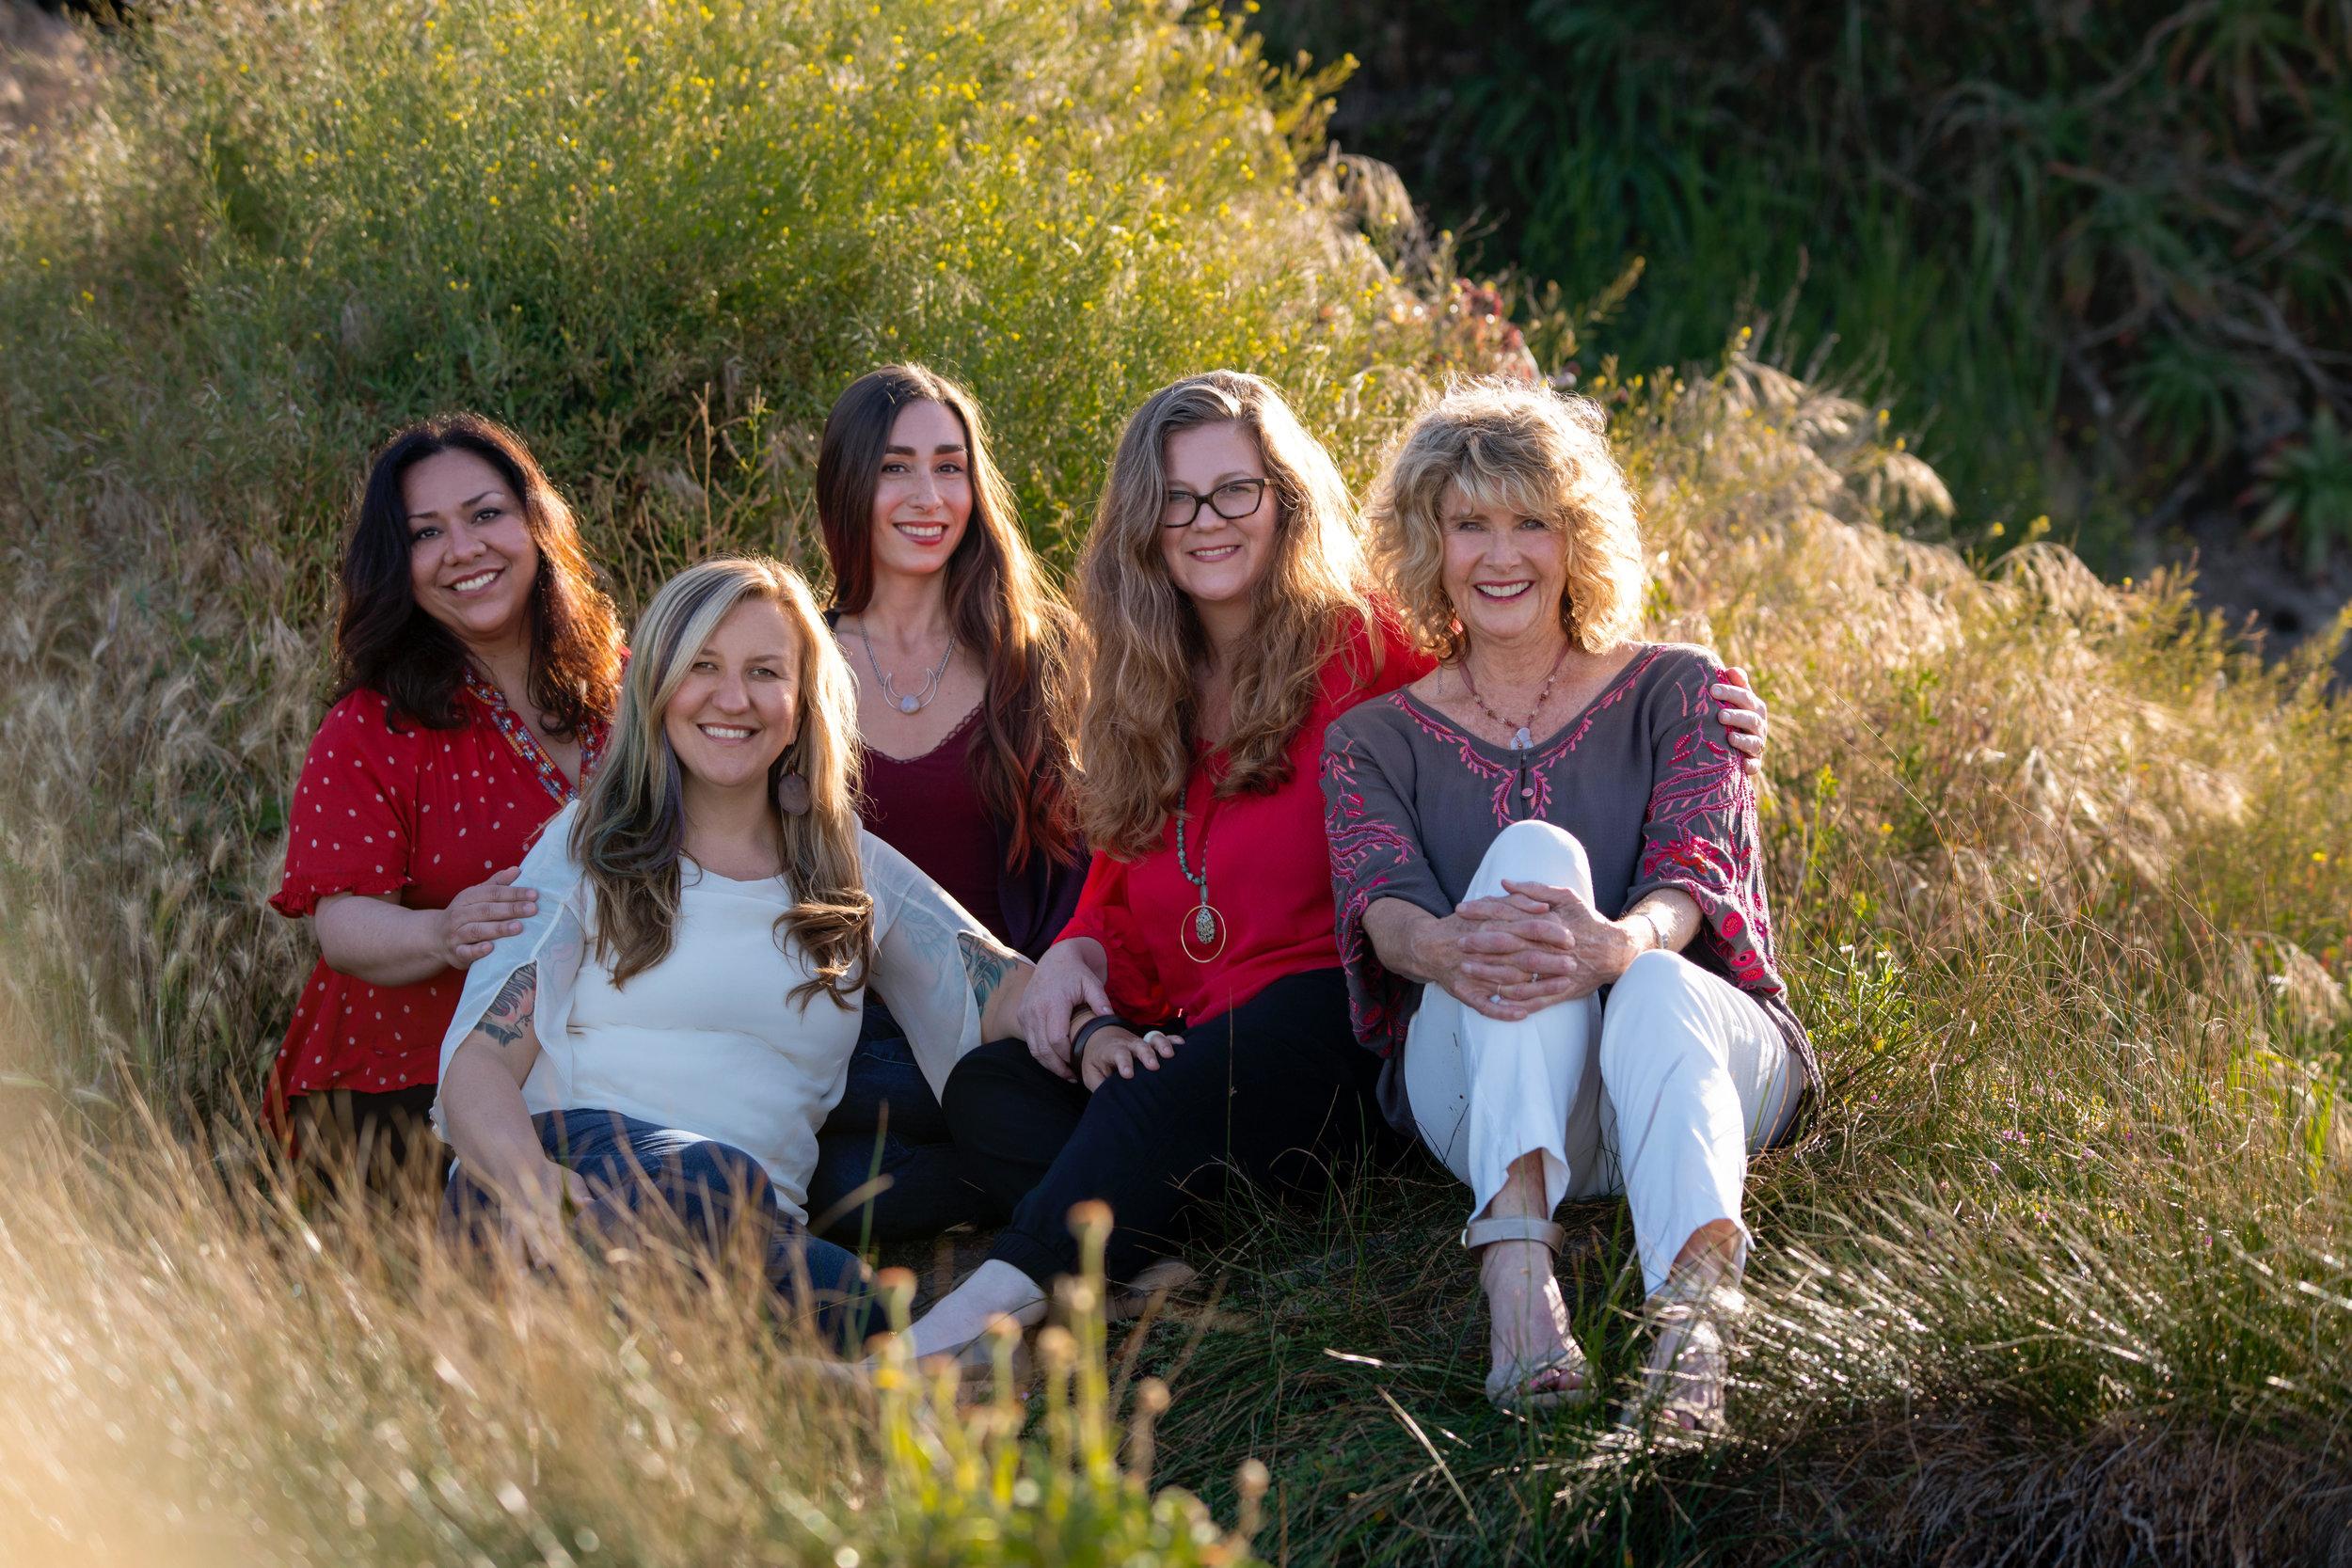 Acubloom - a healing house  Dr. monica Montoya, n.d., Kaye Coleman, ccht, Kass Harp, Dr. kristan roth, DOAM and Sally Barton, BWP, CMT